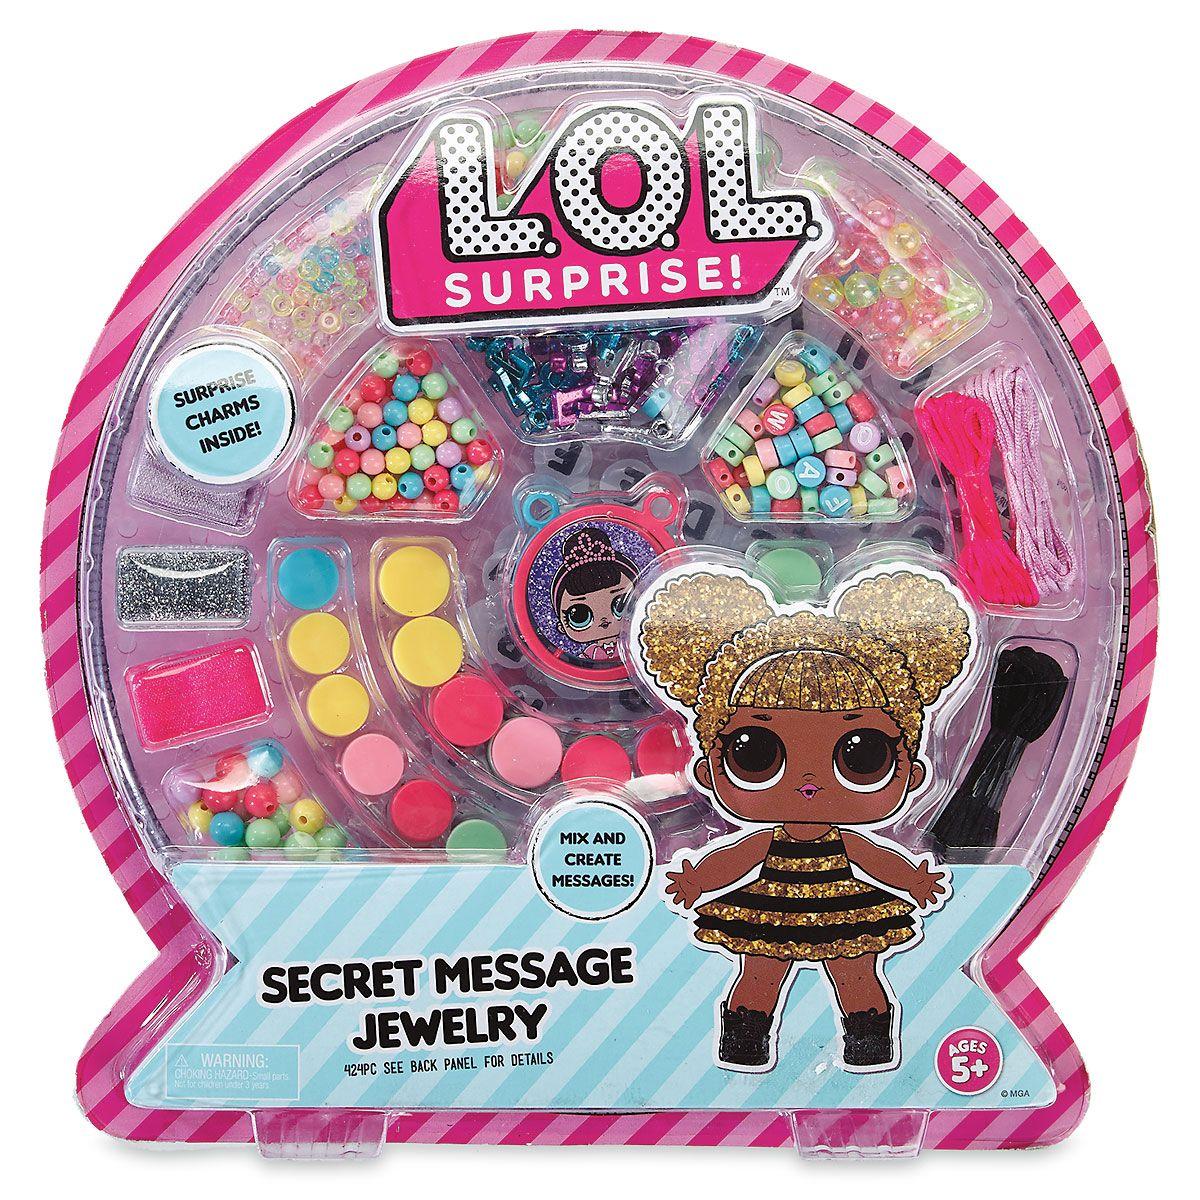 LOL Surprise! Secret Message Jewelry